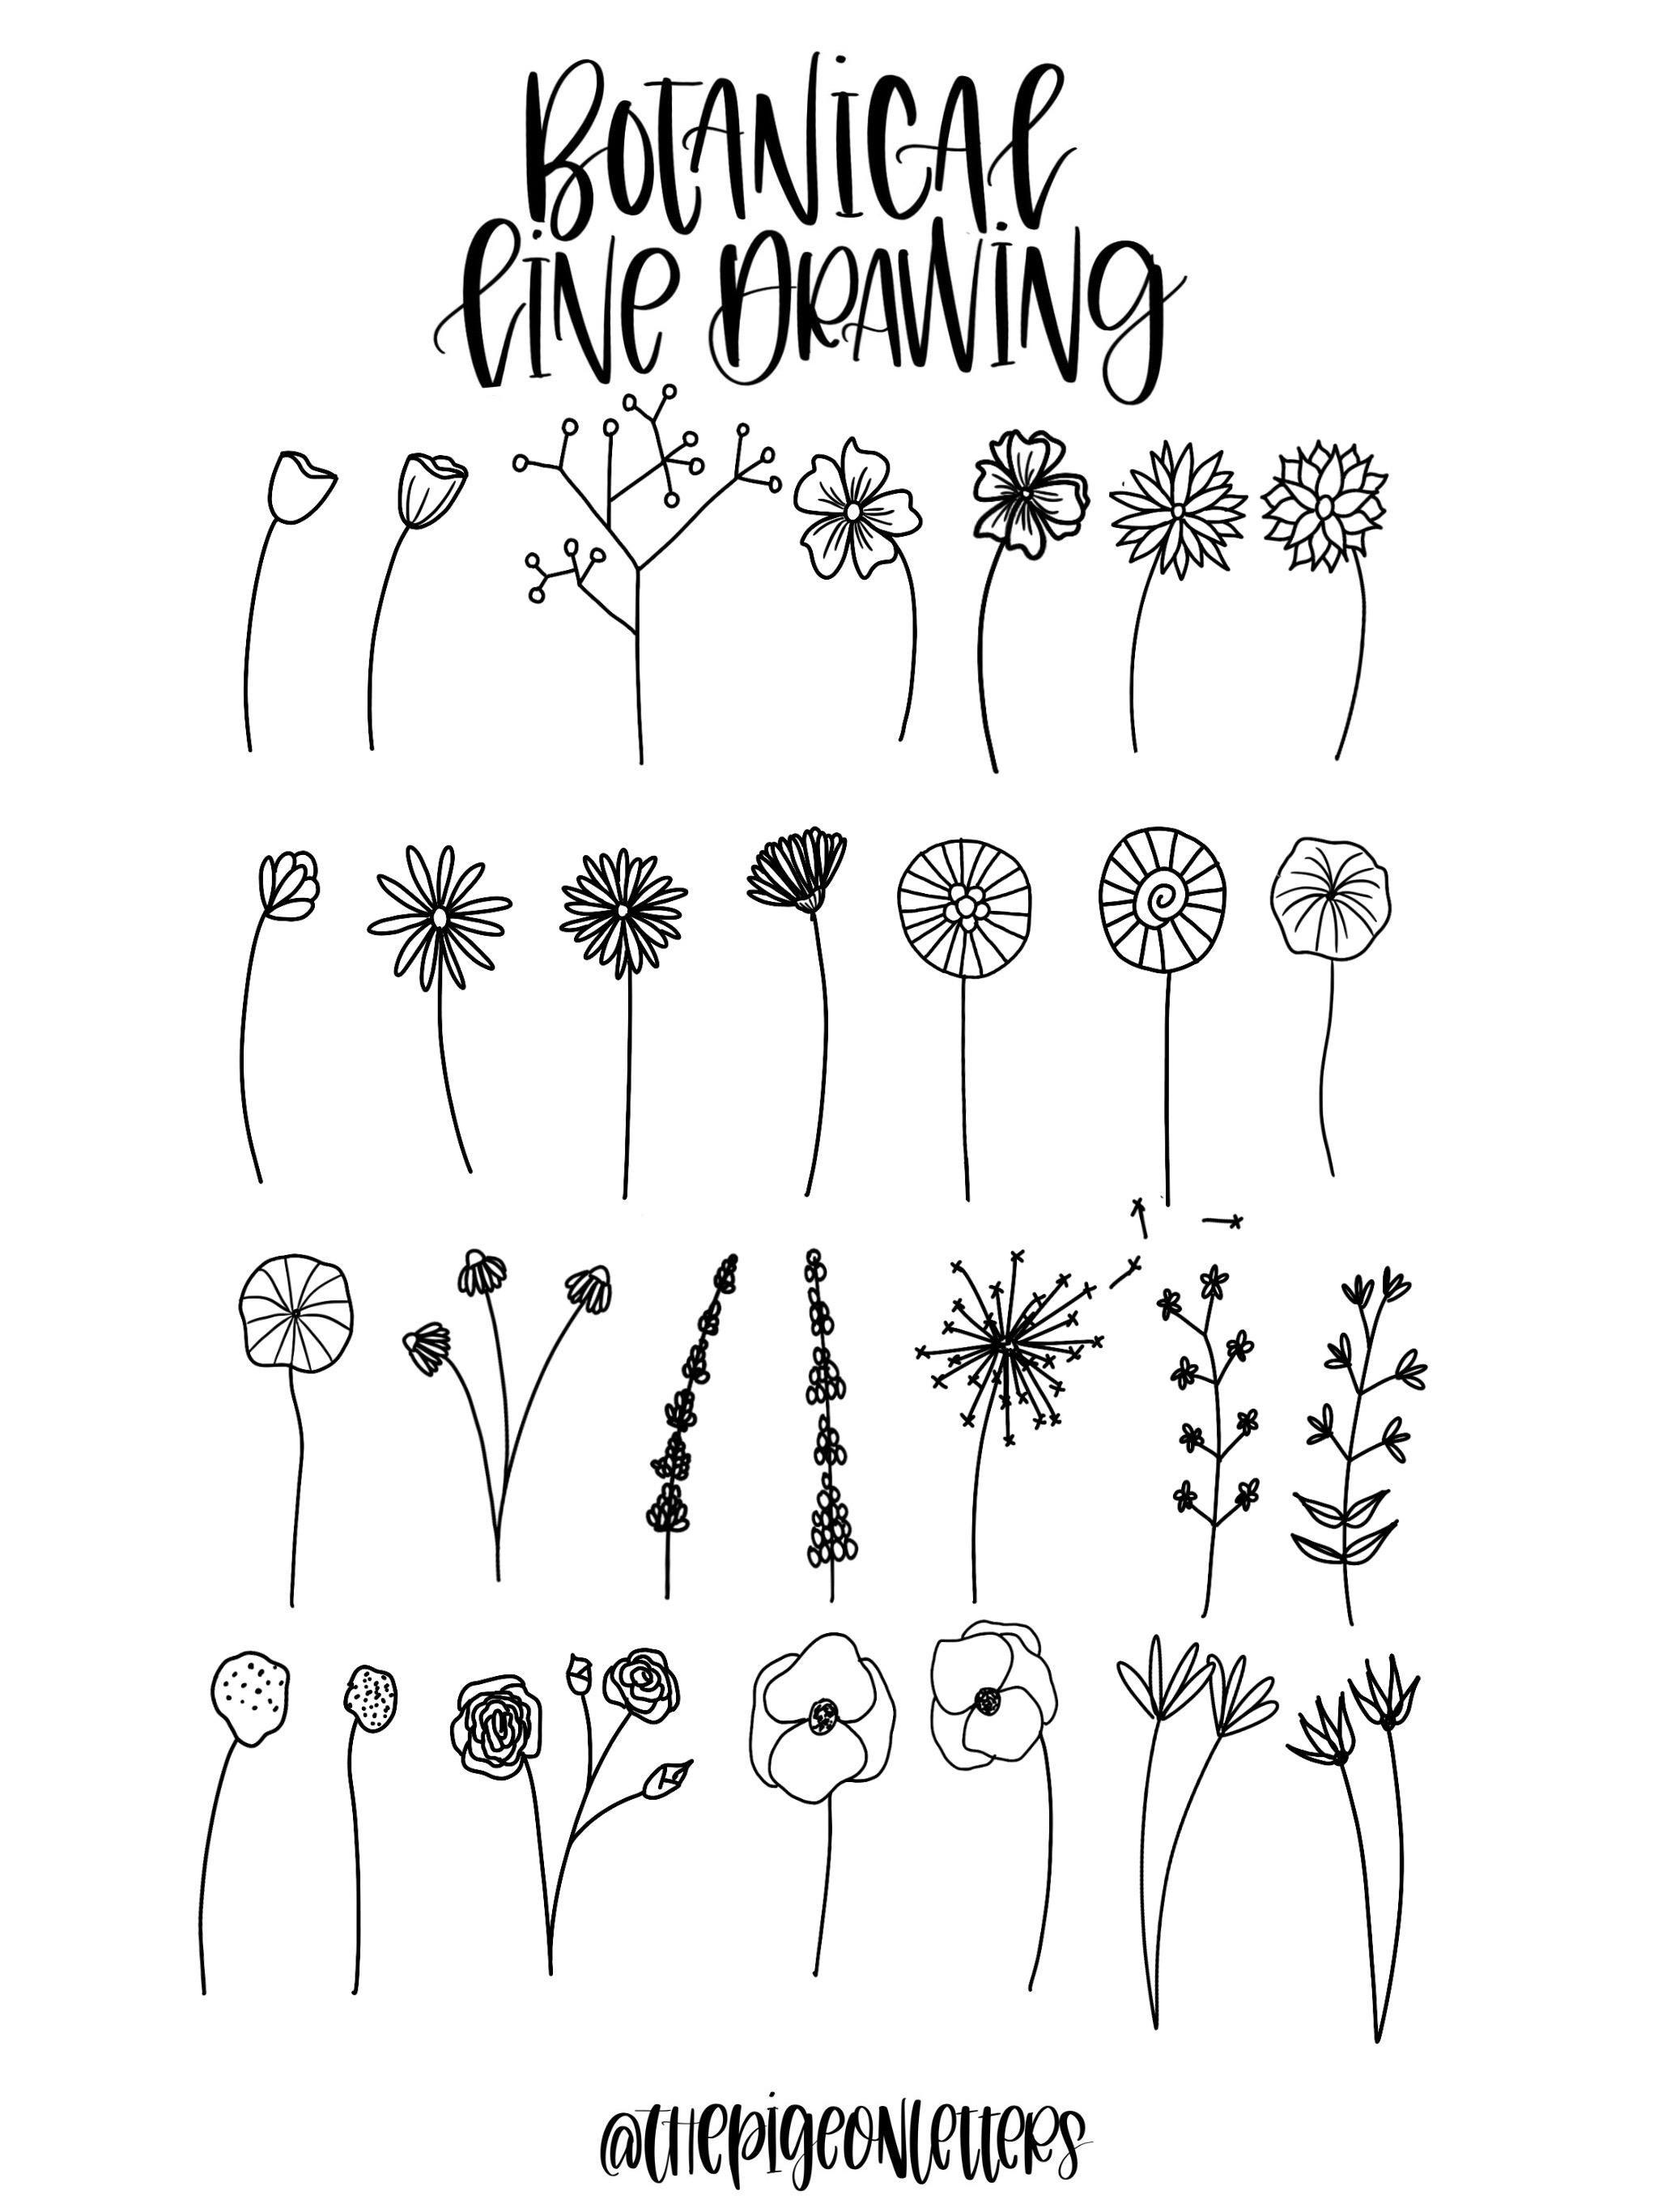 Botanical line drawing skillshare diy lifehacks pinterest